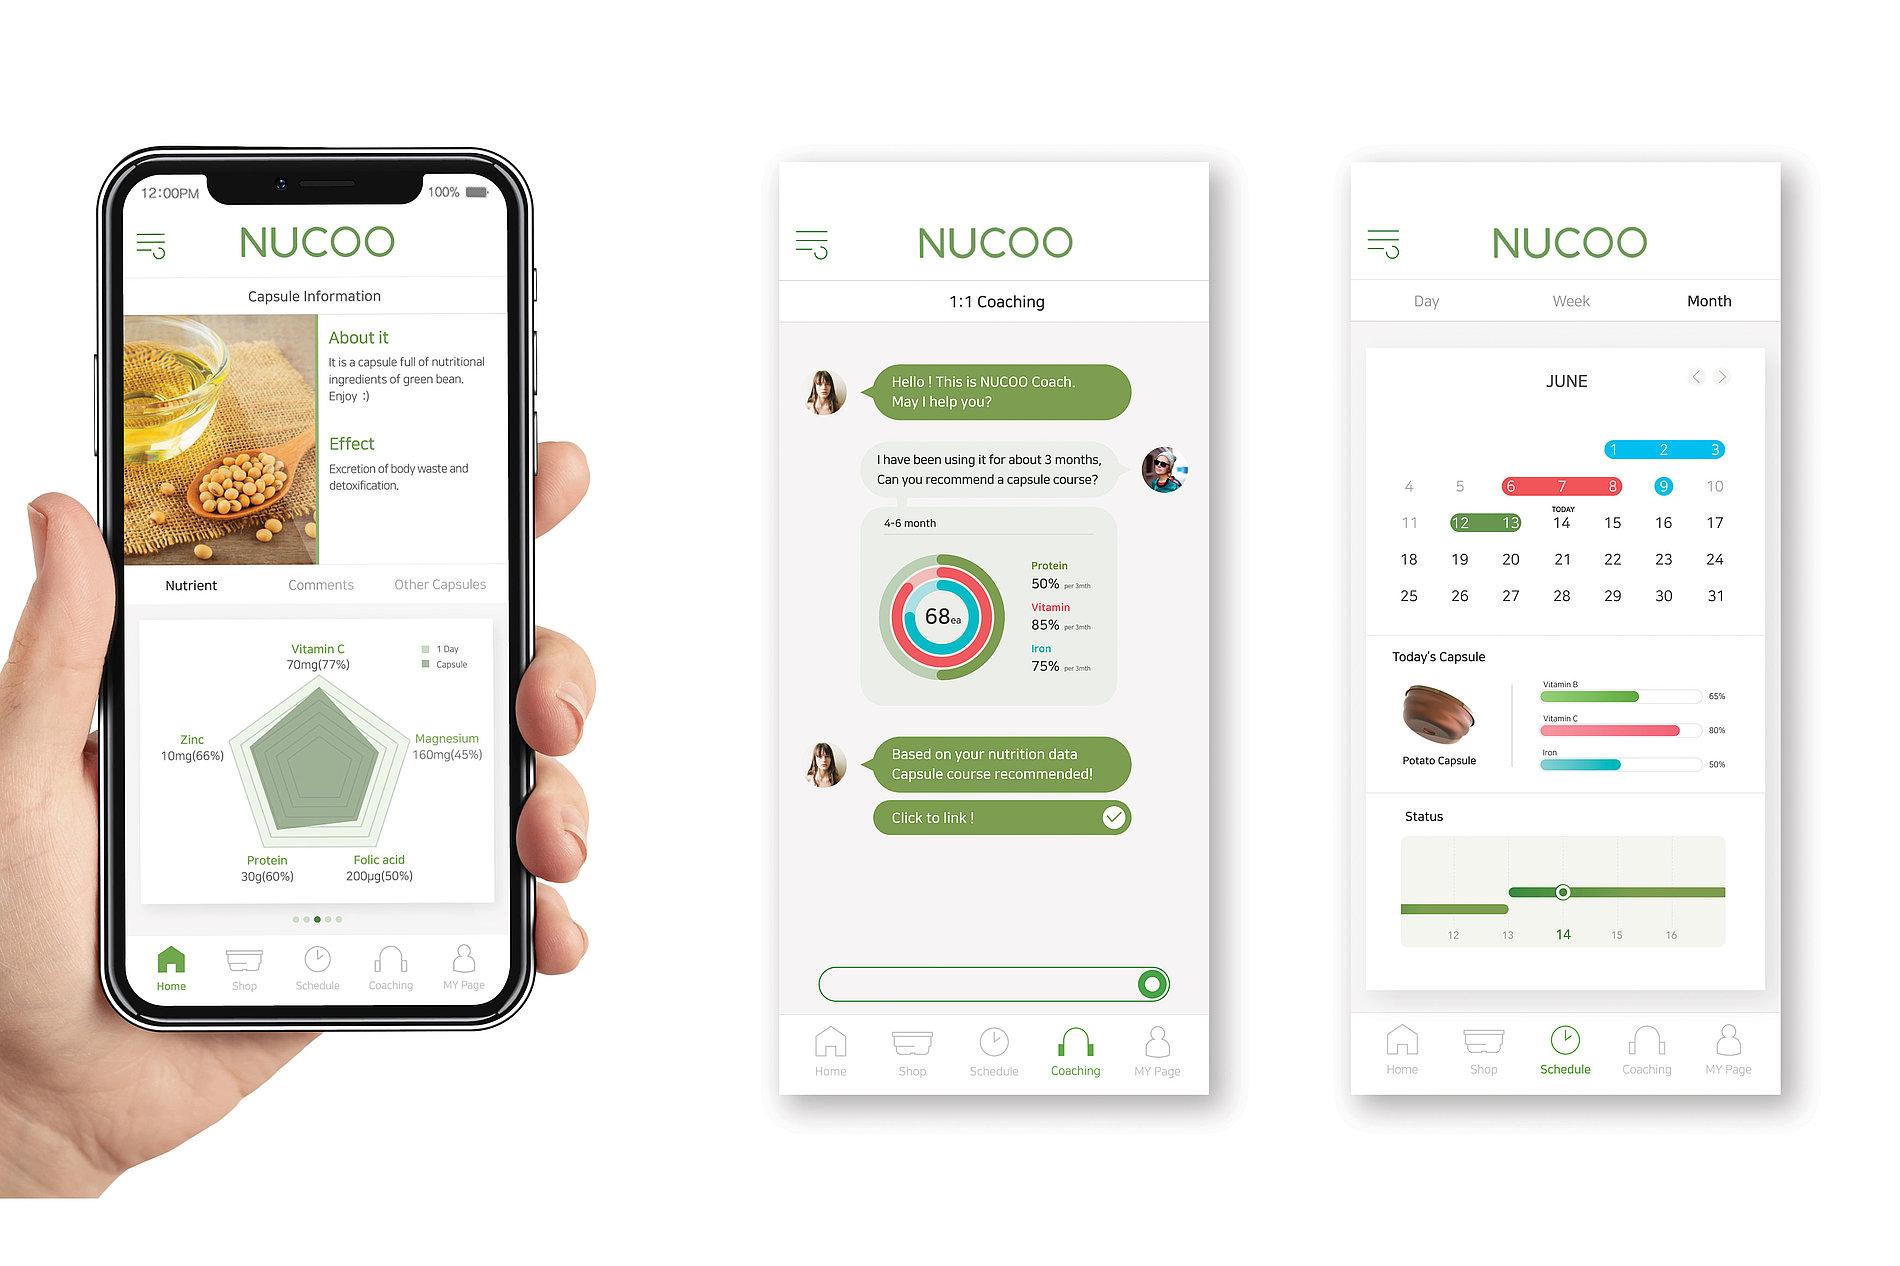 NUCOO | Red Dot Design Award